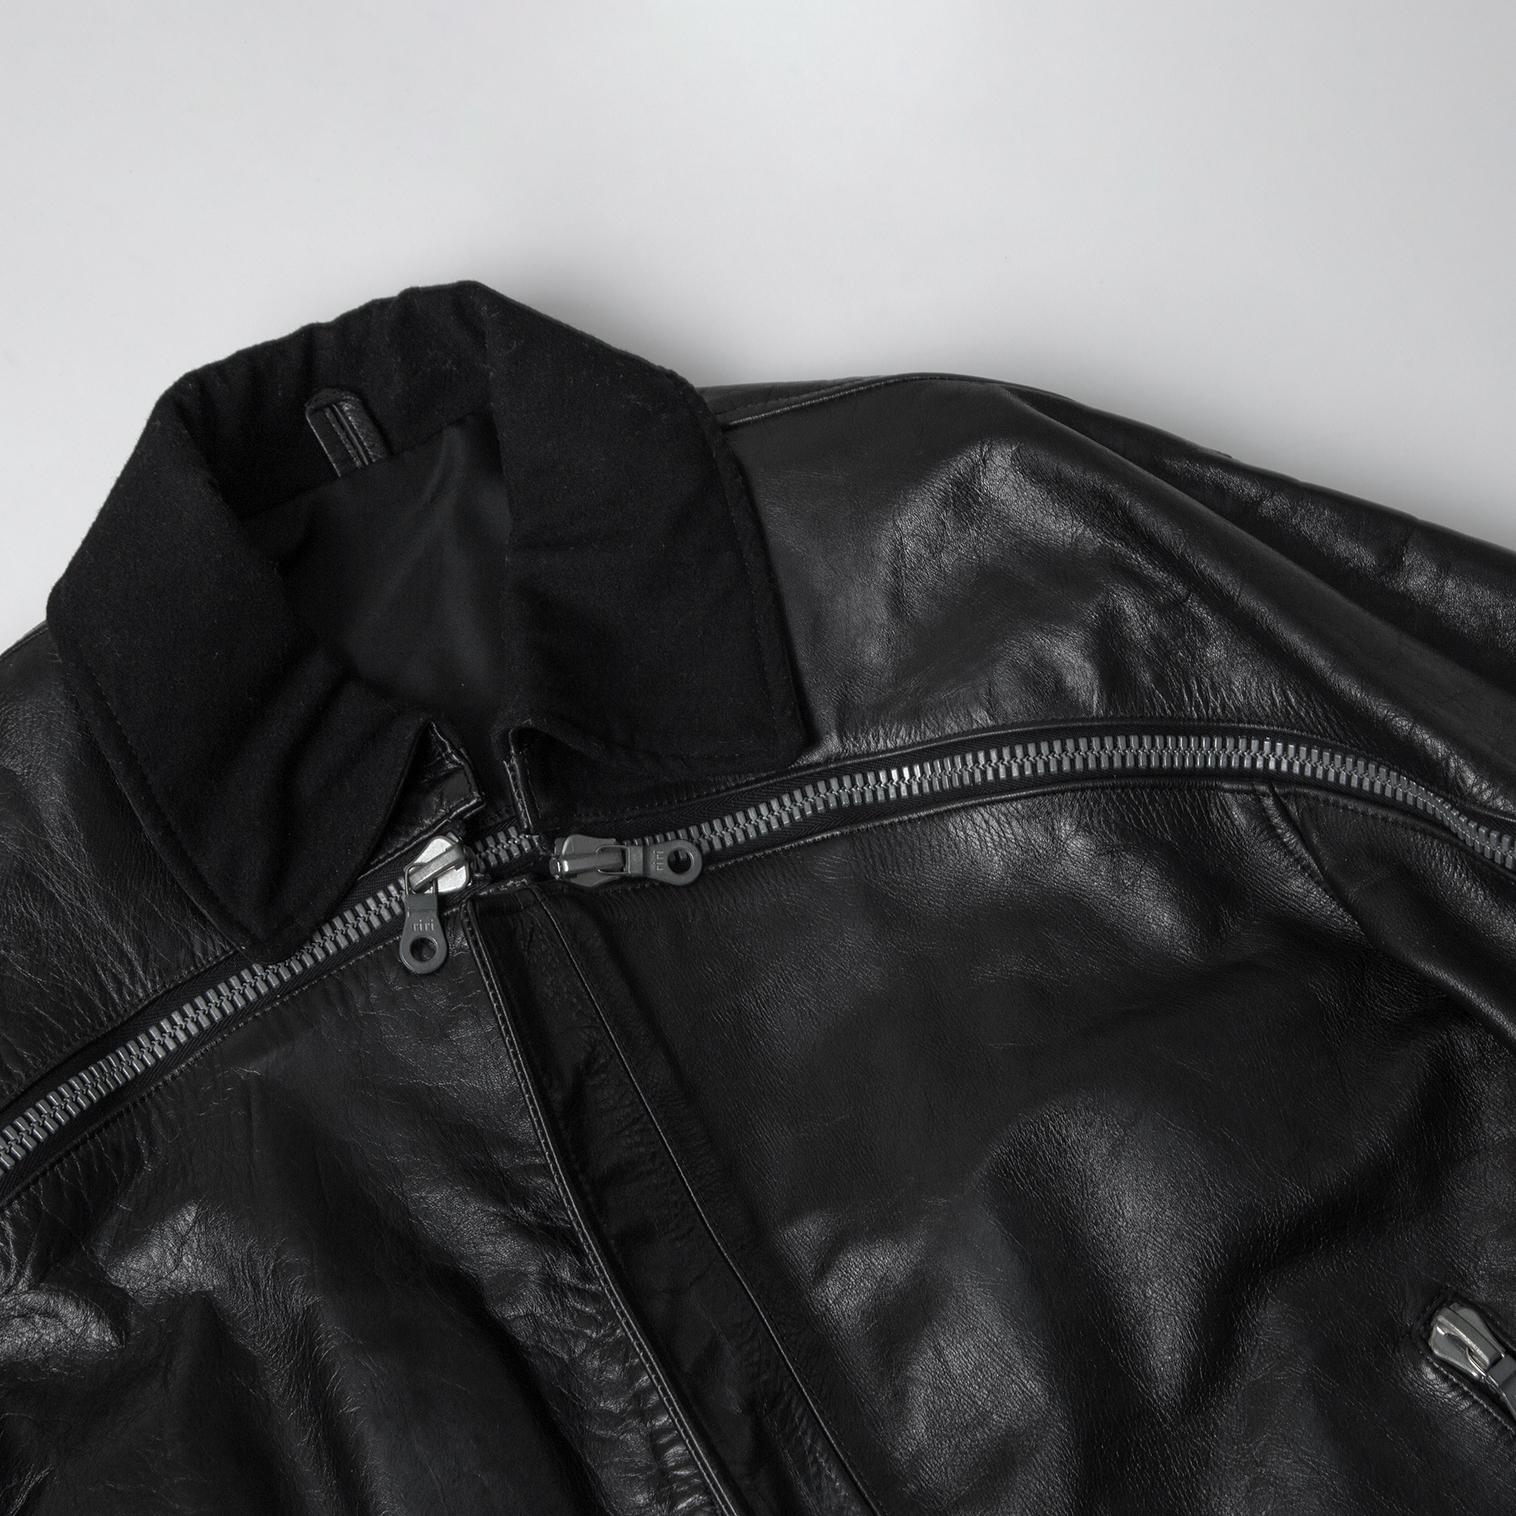 Yohji Yamamoto POUR HOMME 6.1 THE MEN Leather Jacket